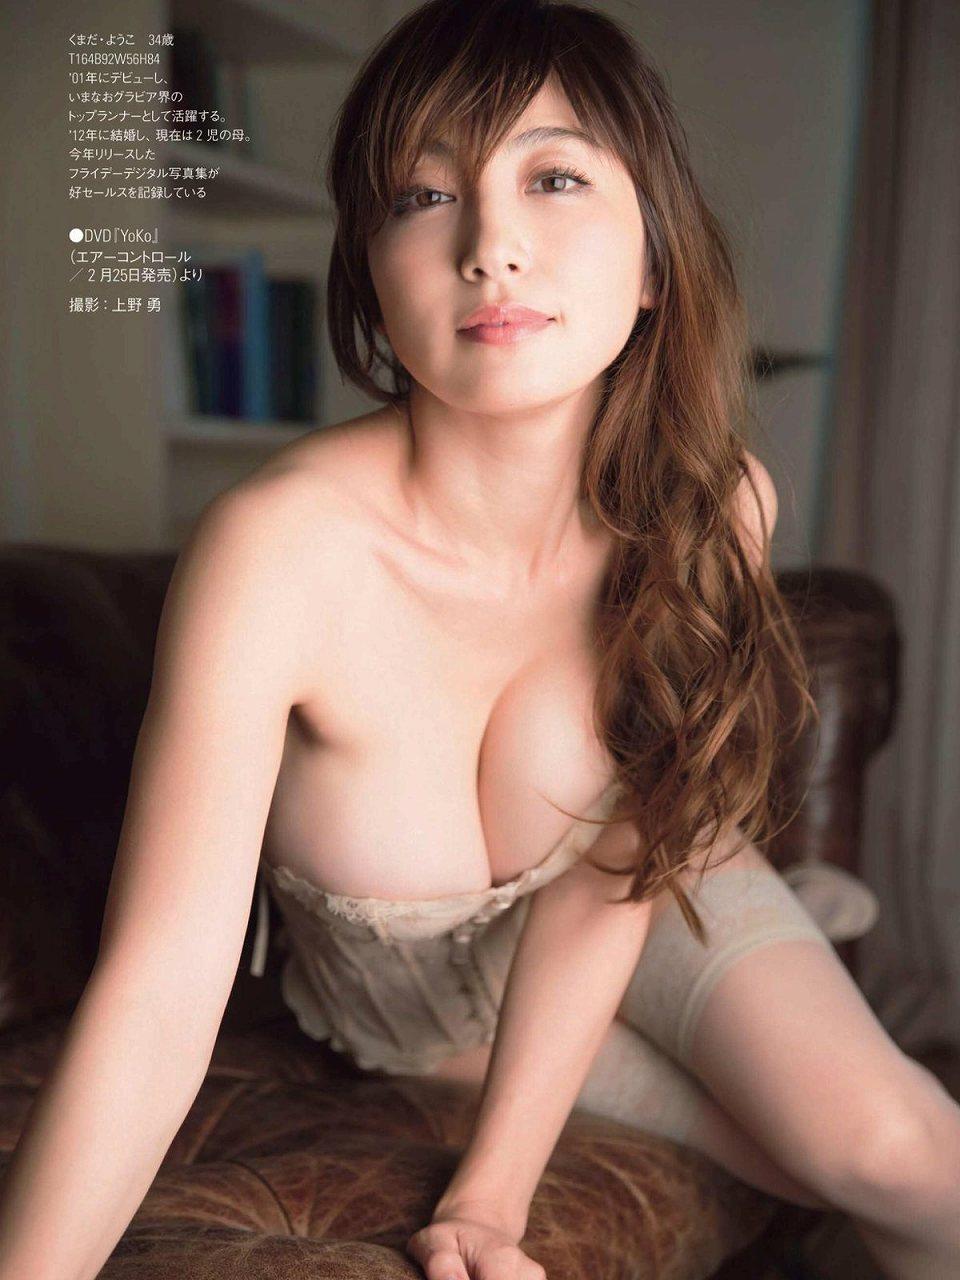 「FRIDAY(フライデー) 2017年 3/3 号」熊田曜子のおっぱい谷間グラビア